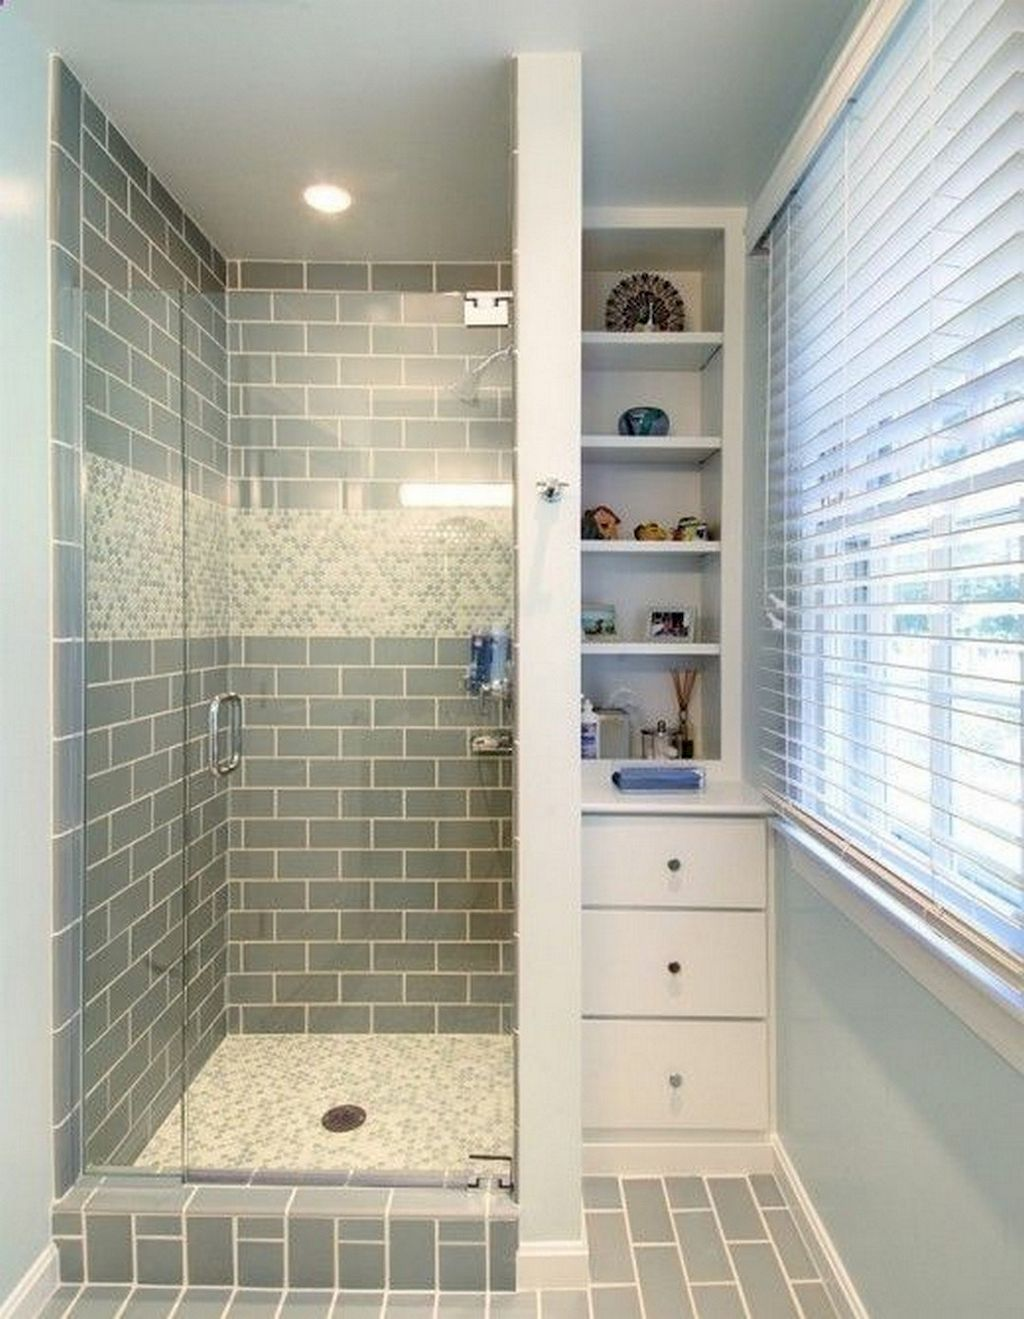 80 Inexpensive Bathroom Remodeling Ideas #bathroom #ideas #Inexpensive # Remodel